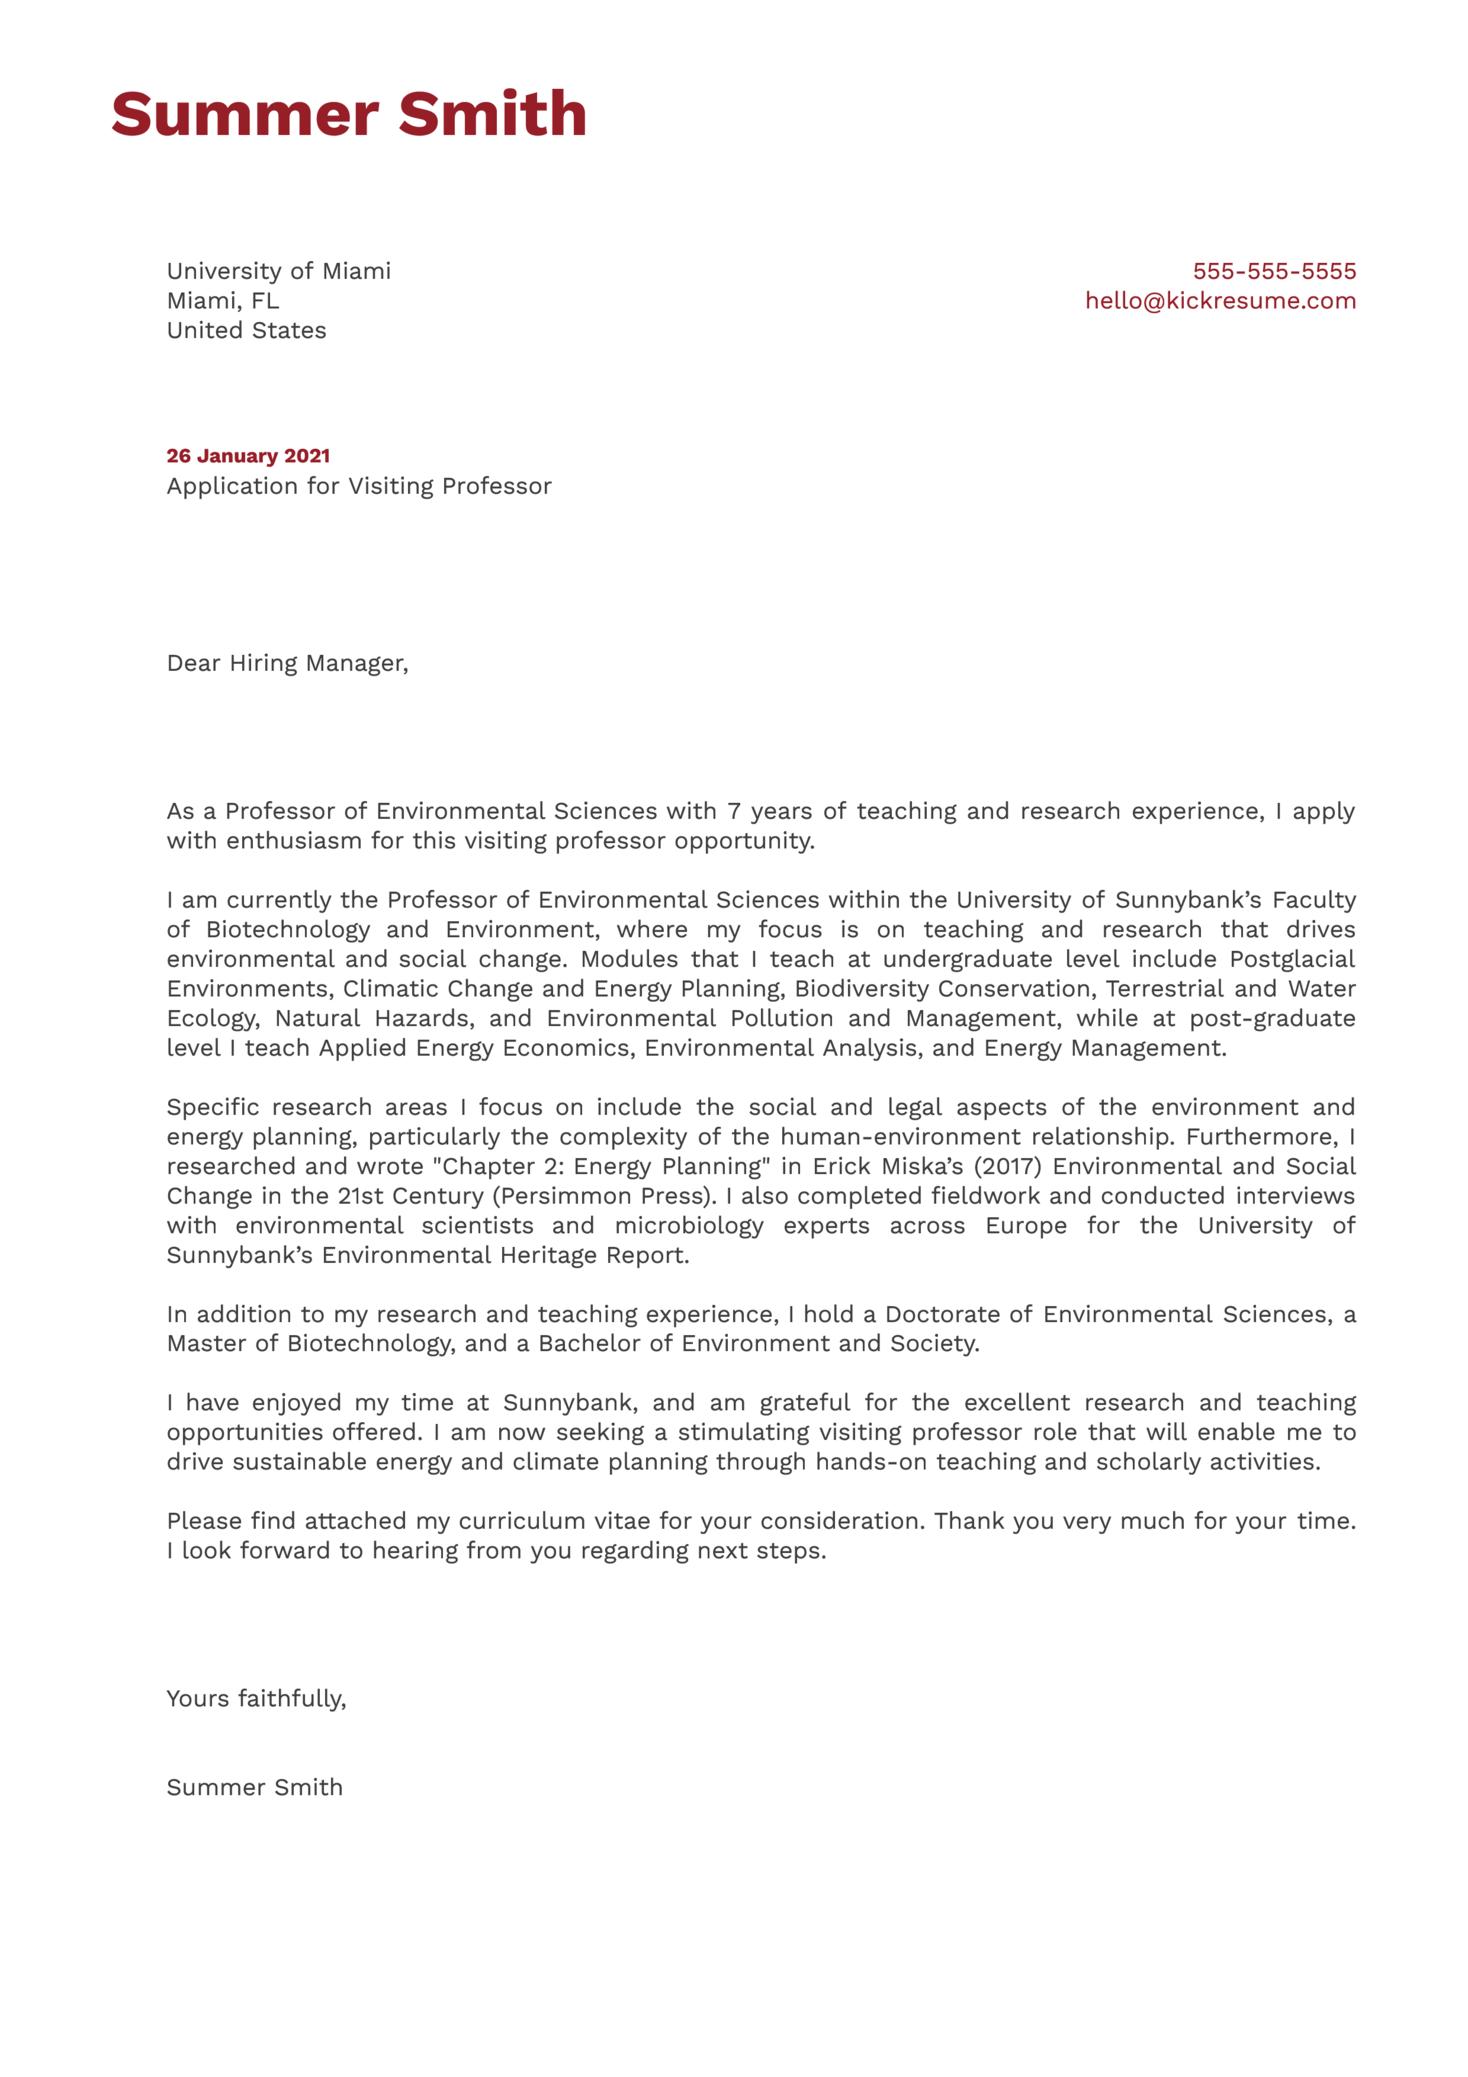 Visiting Professor Cover Letter Sample